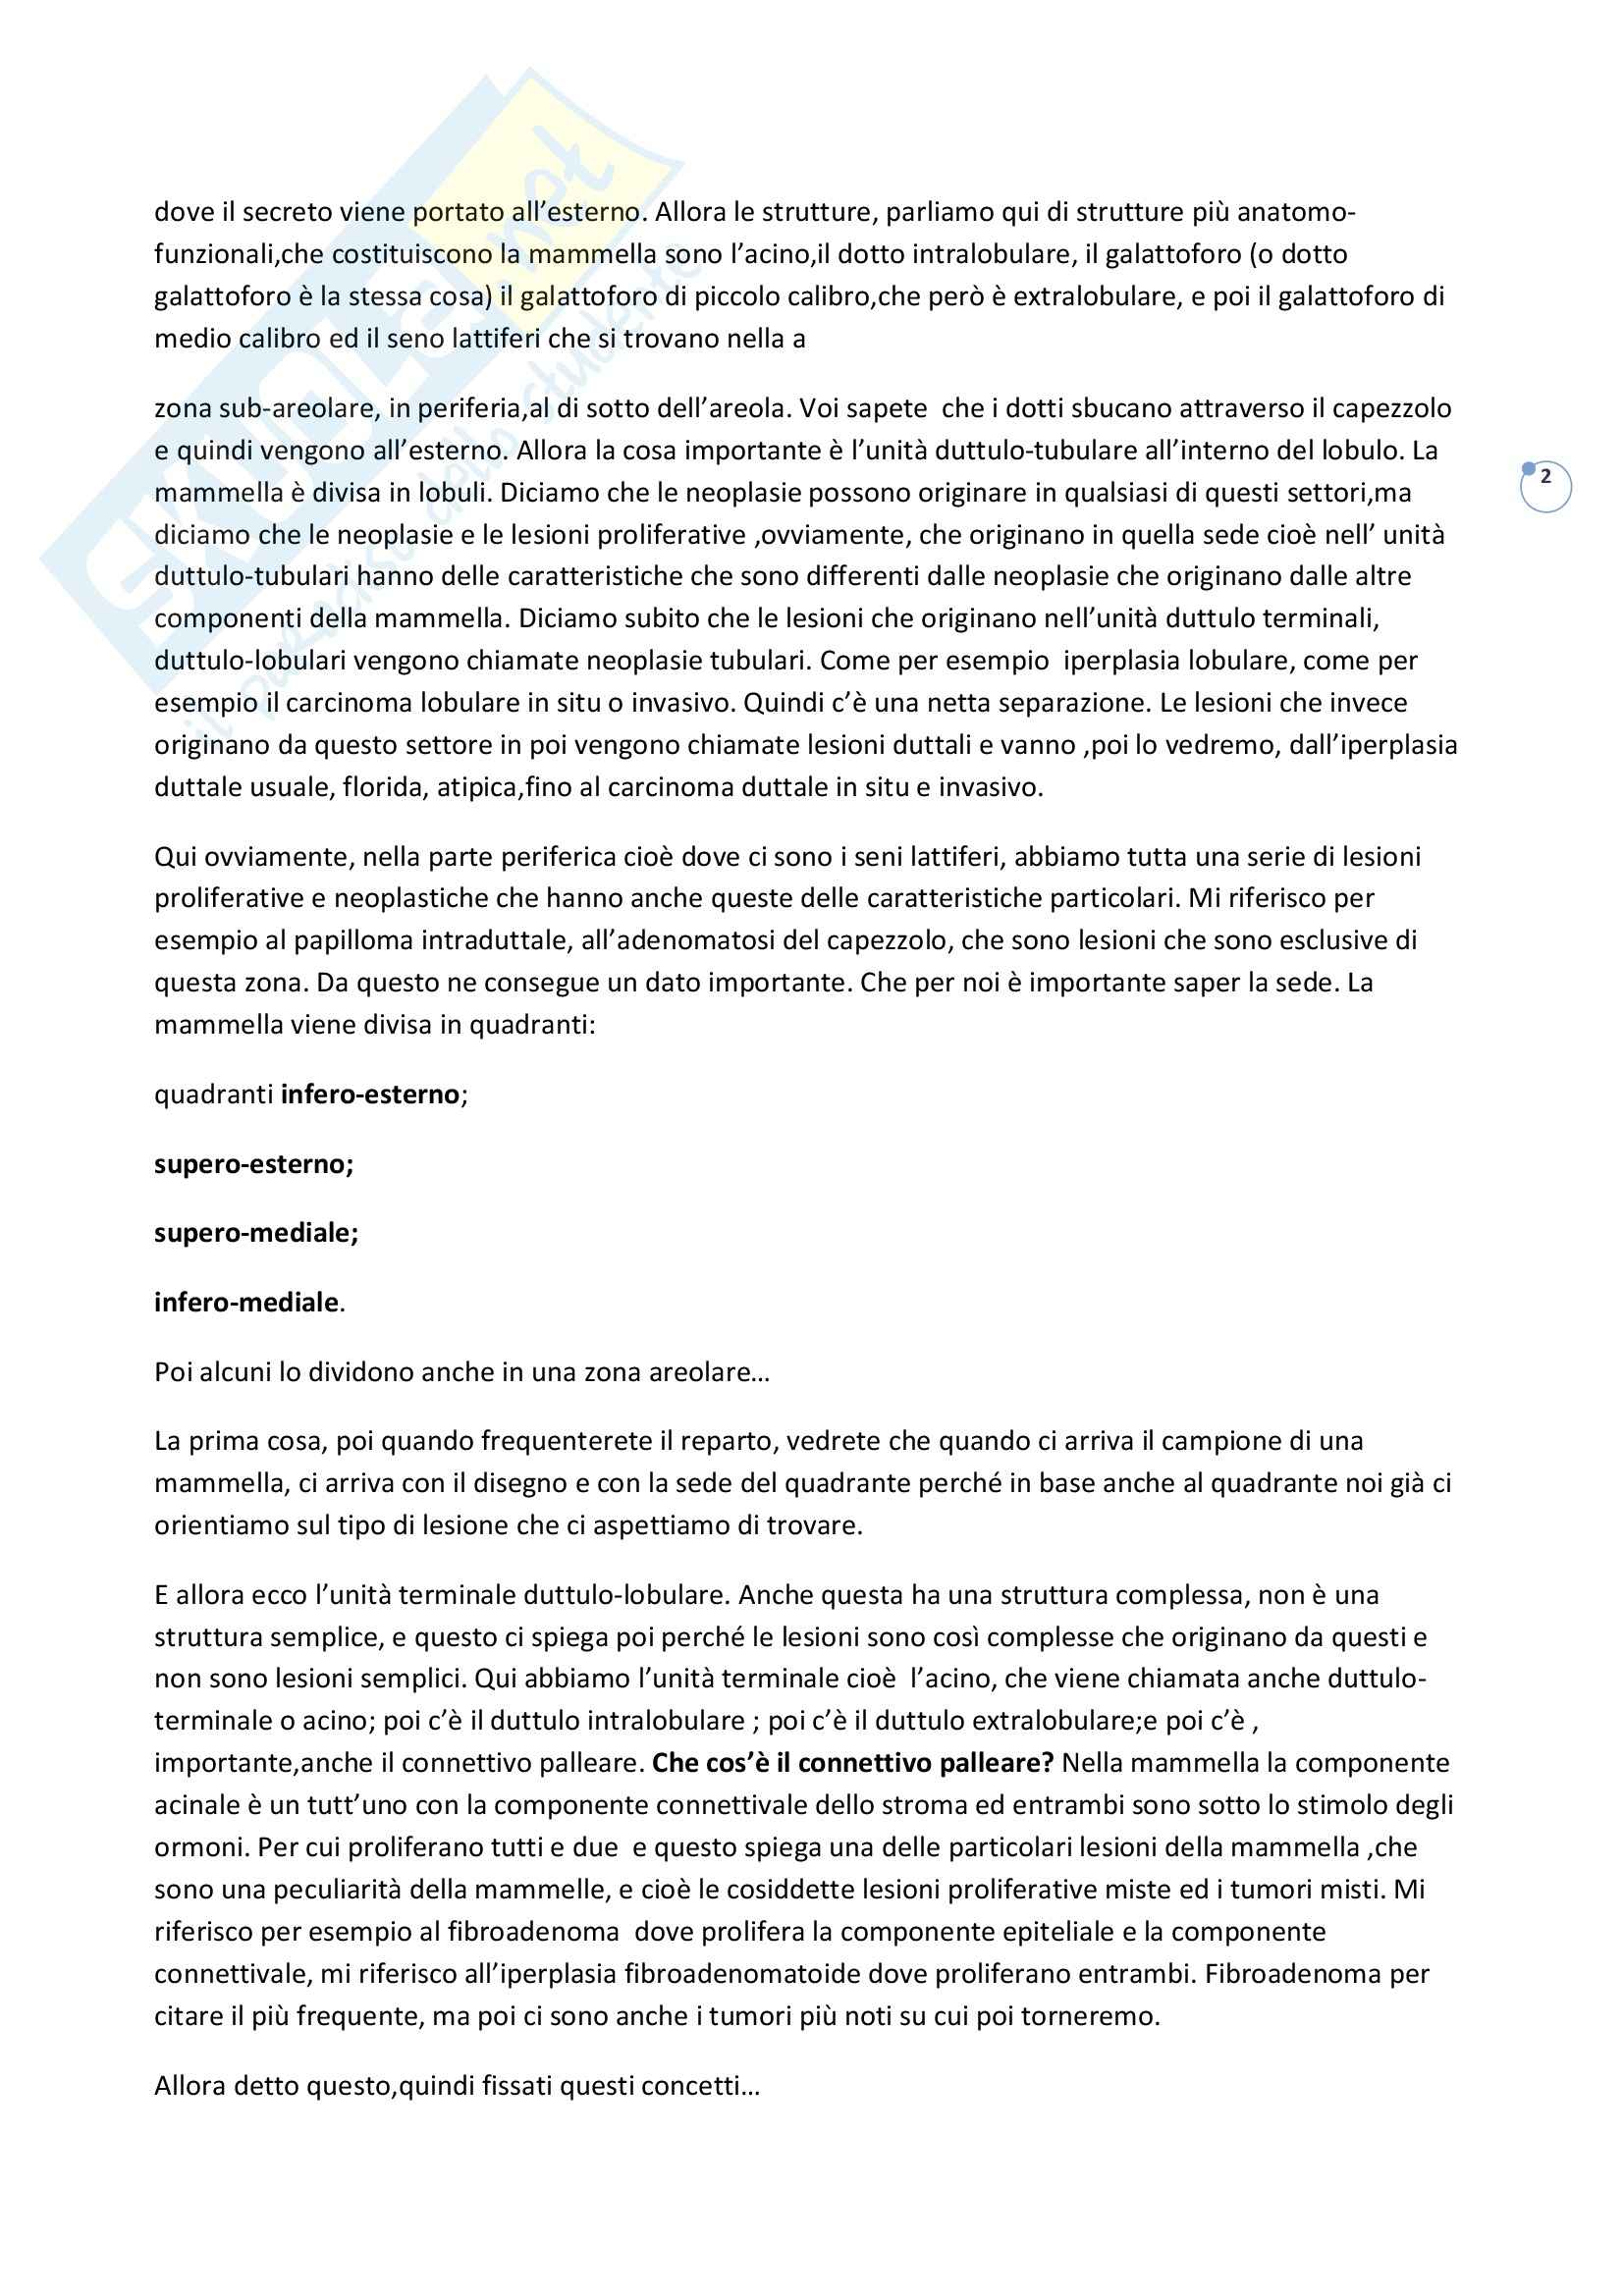 Anatomia patologica - lesioni proliferative Pag. 2